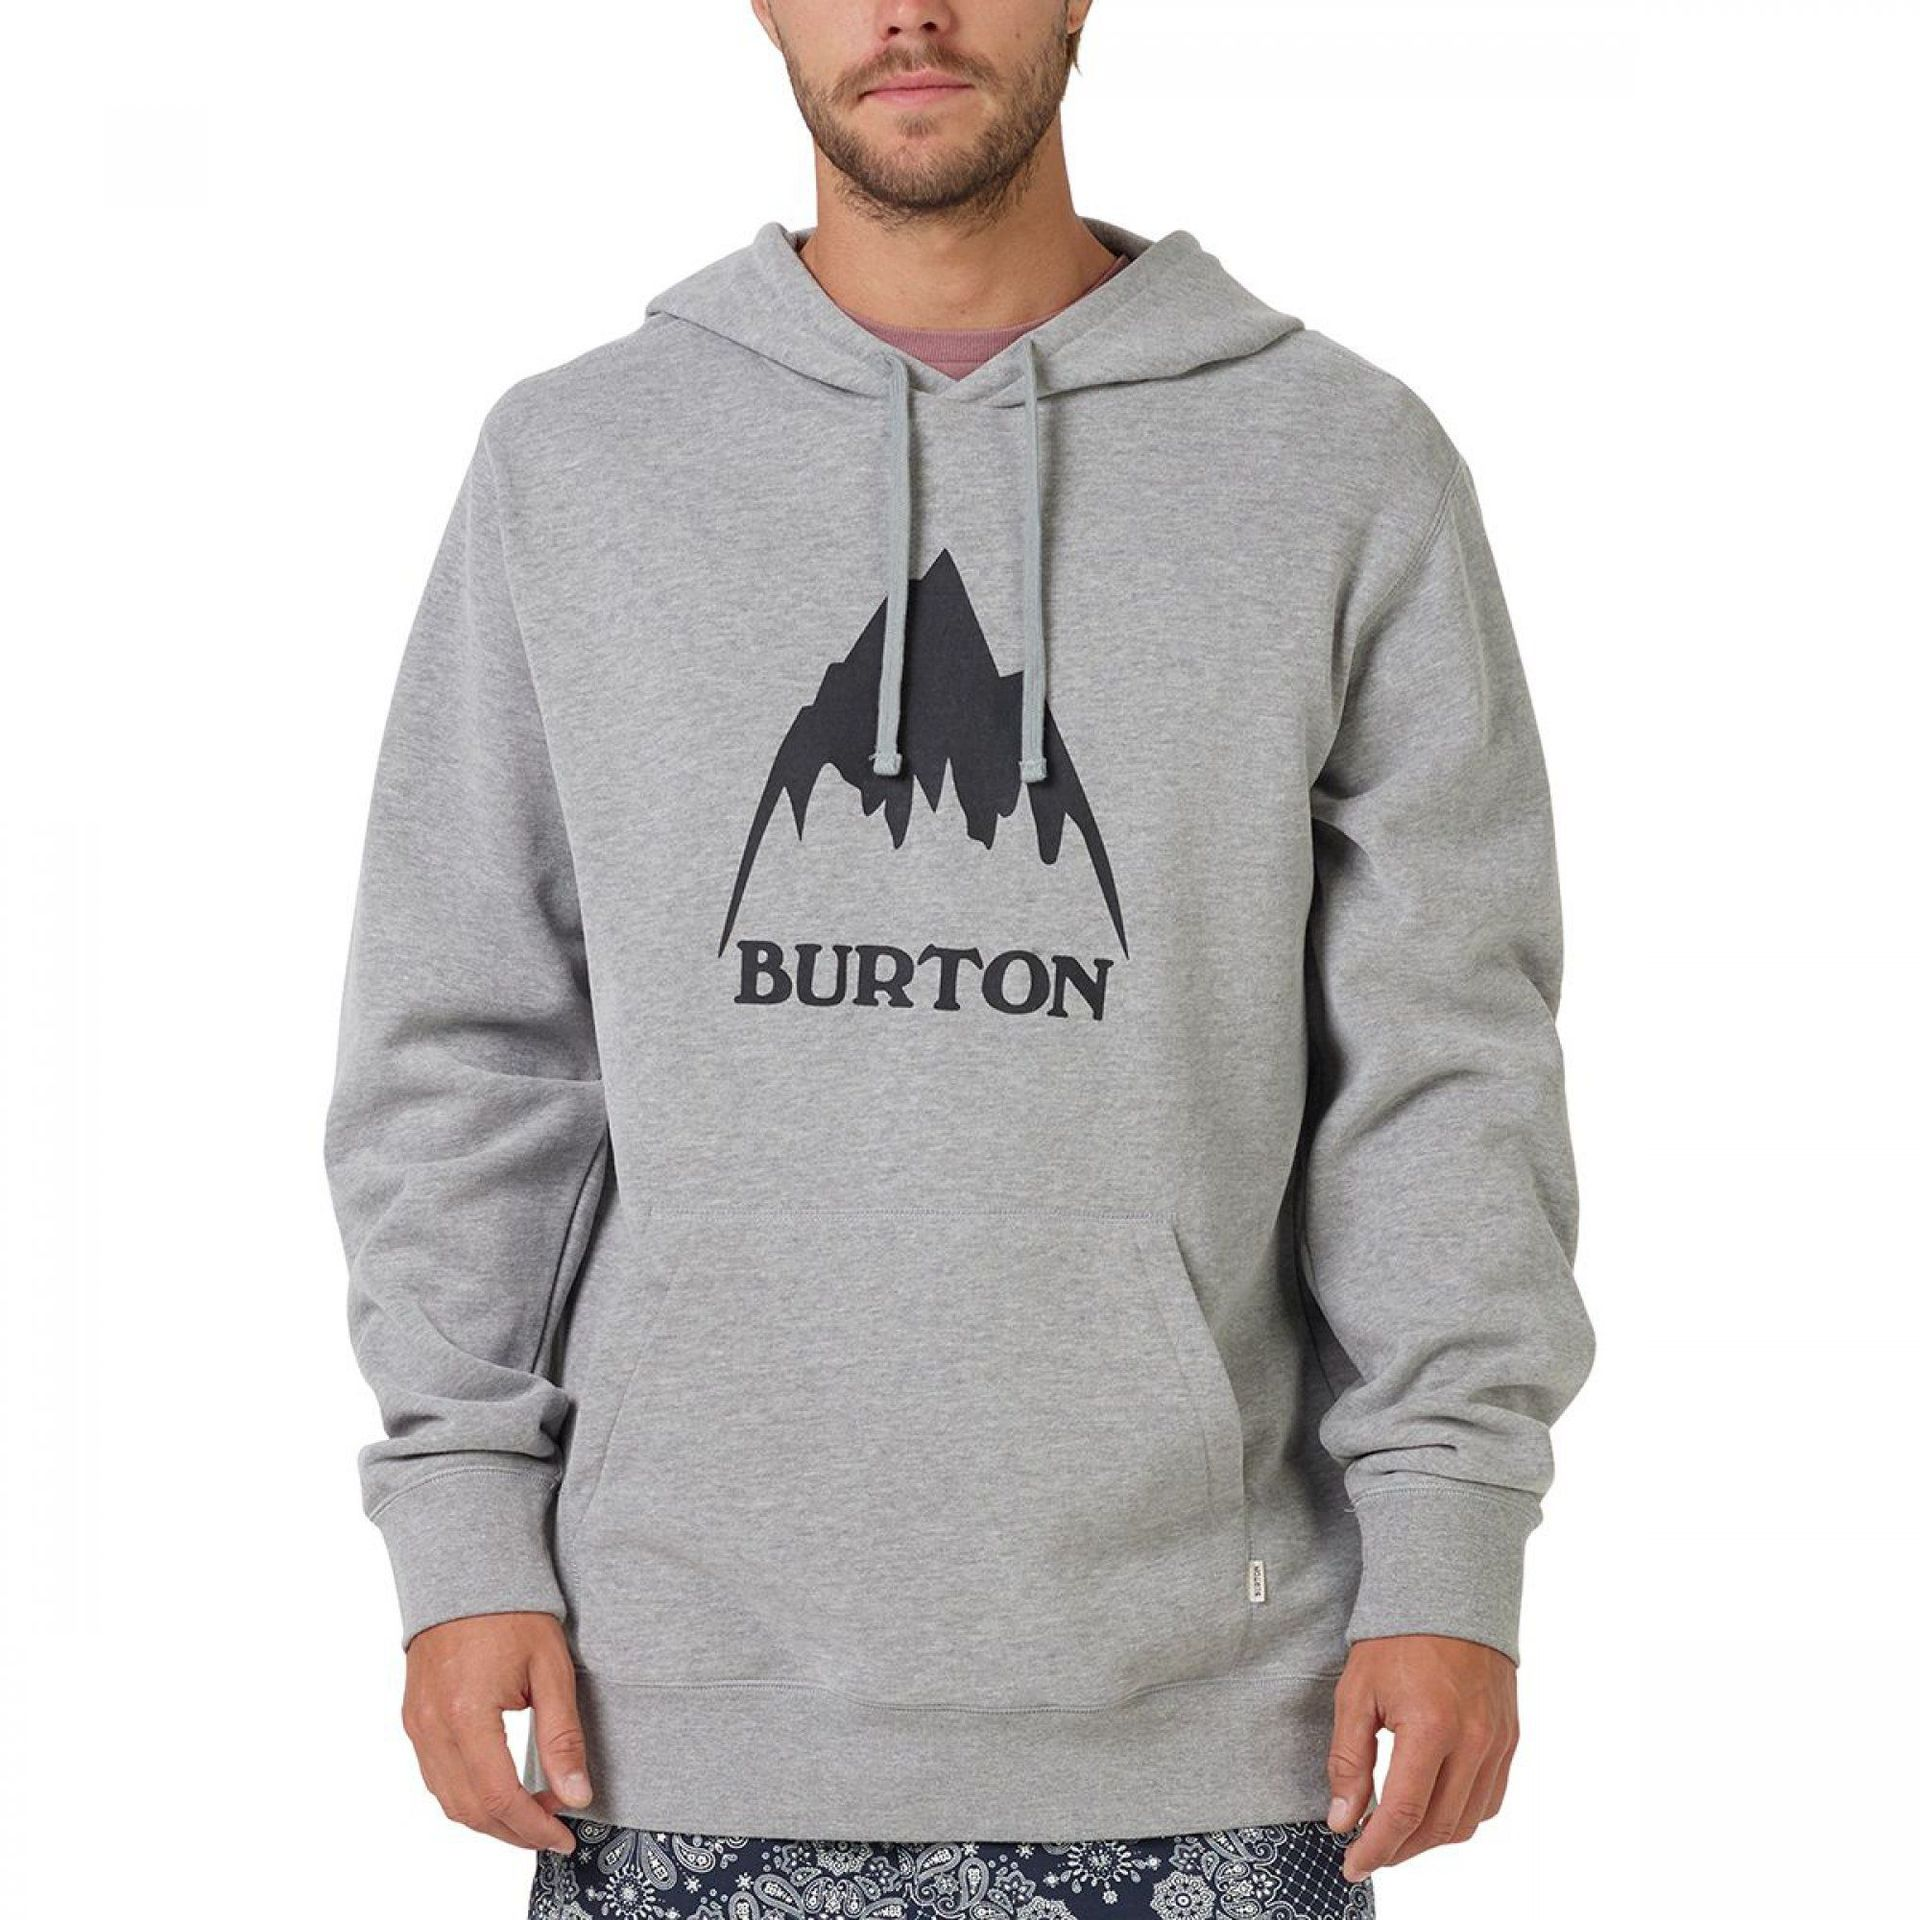 BLUZA BURTON CLASSIC MOUNTAIN PULLOVER GREY HEATHER 2